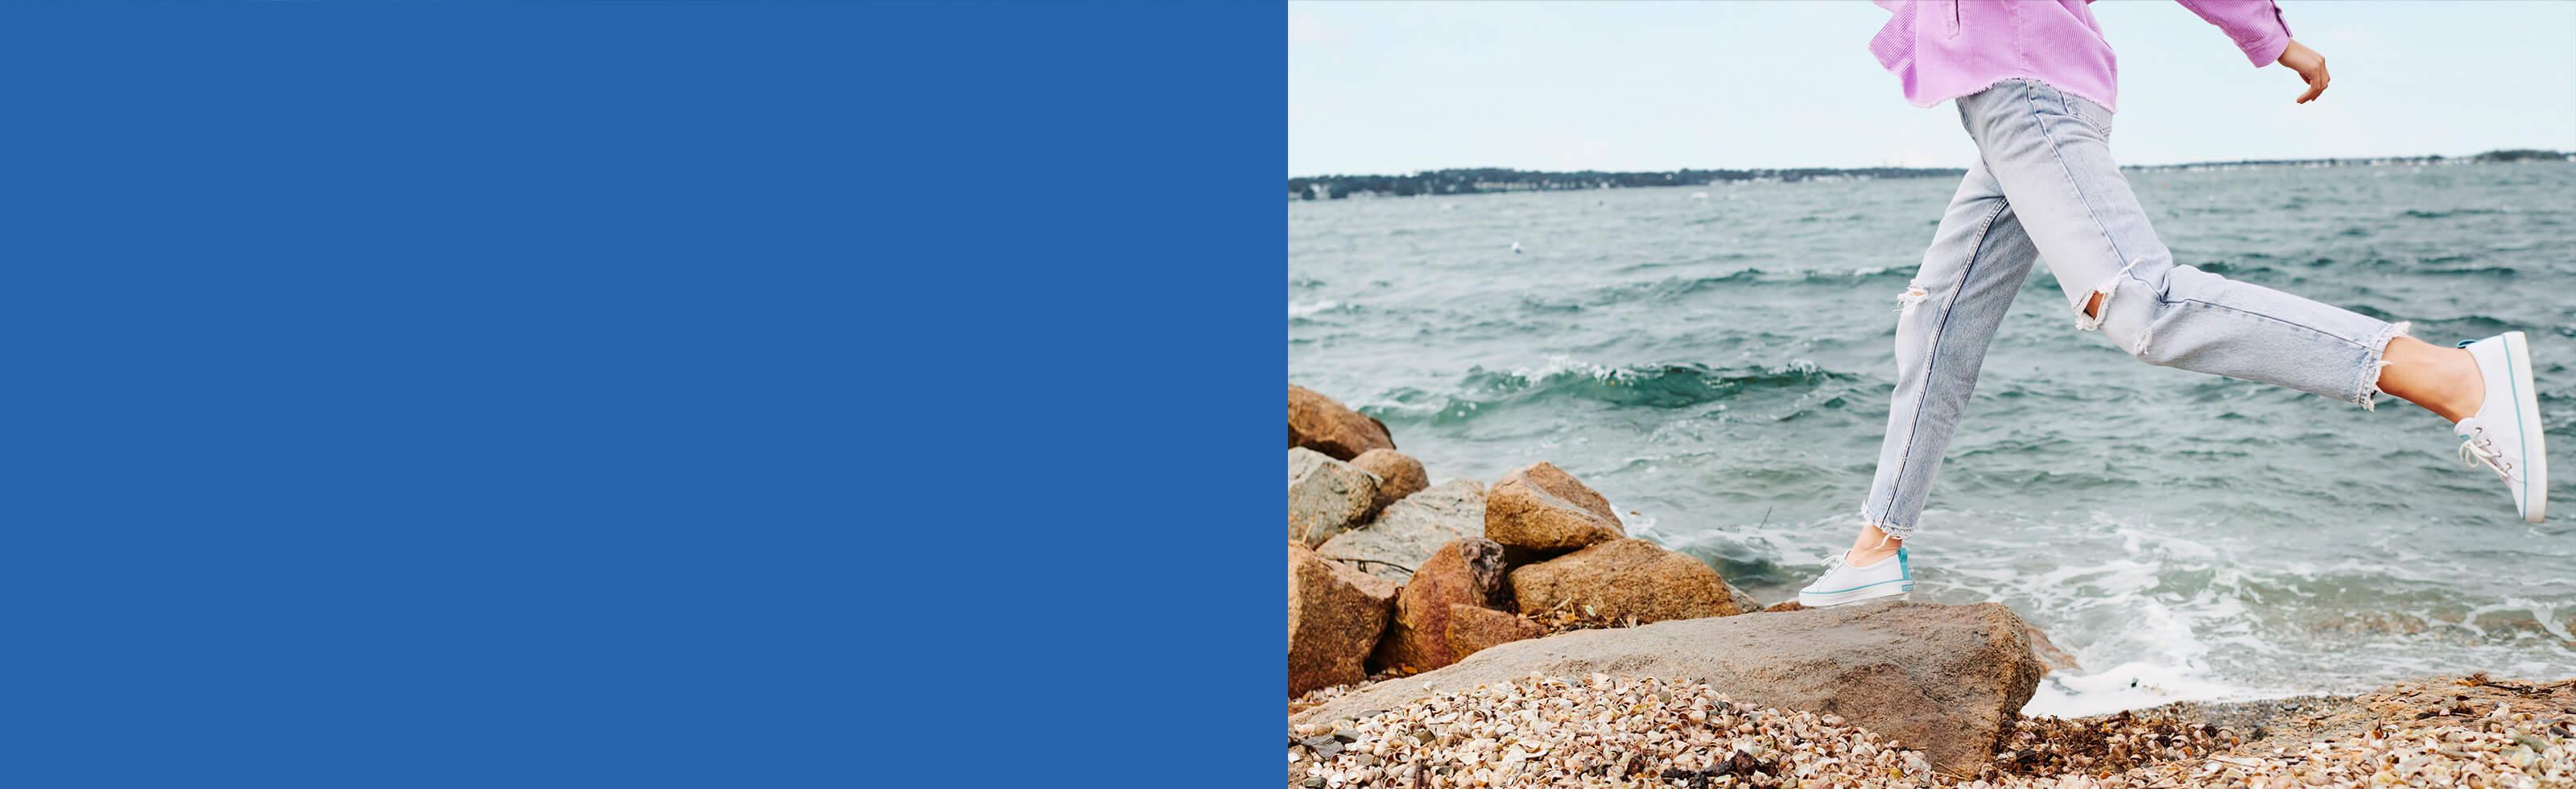 Running over sand and rocks beside the ocean.